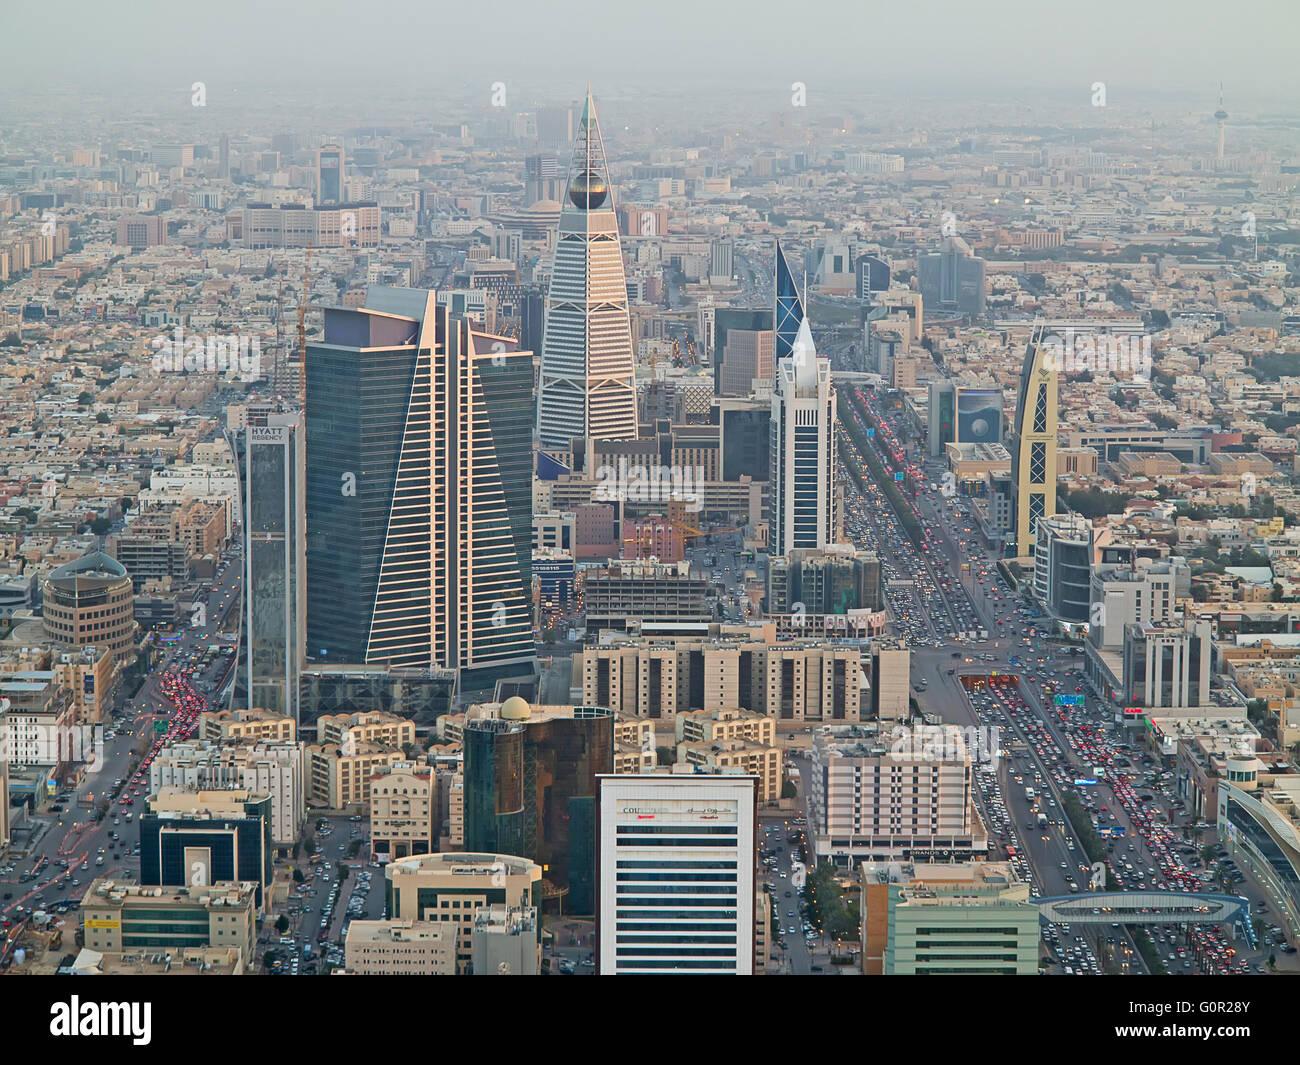 Avis Rent A Car Riyadh